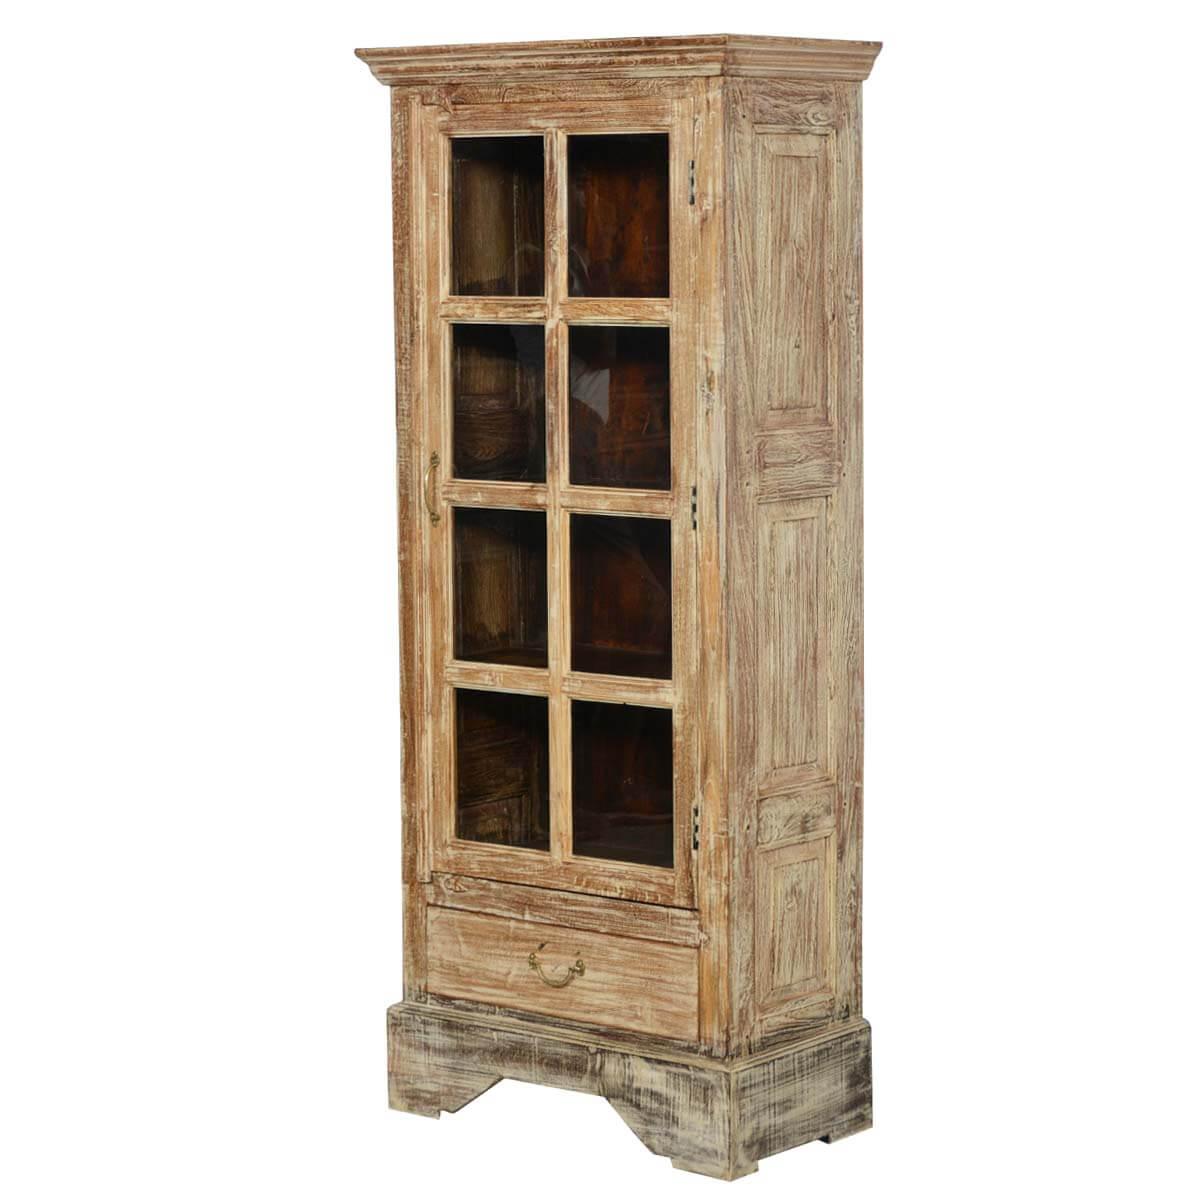 Solid Wood Bedroom Armoire ~ Rustic solid wood glass doors bedroom armoire wardrobe w